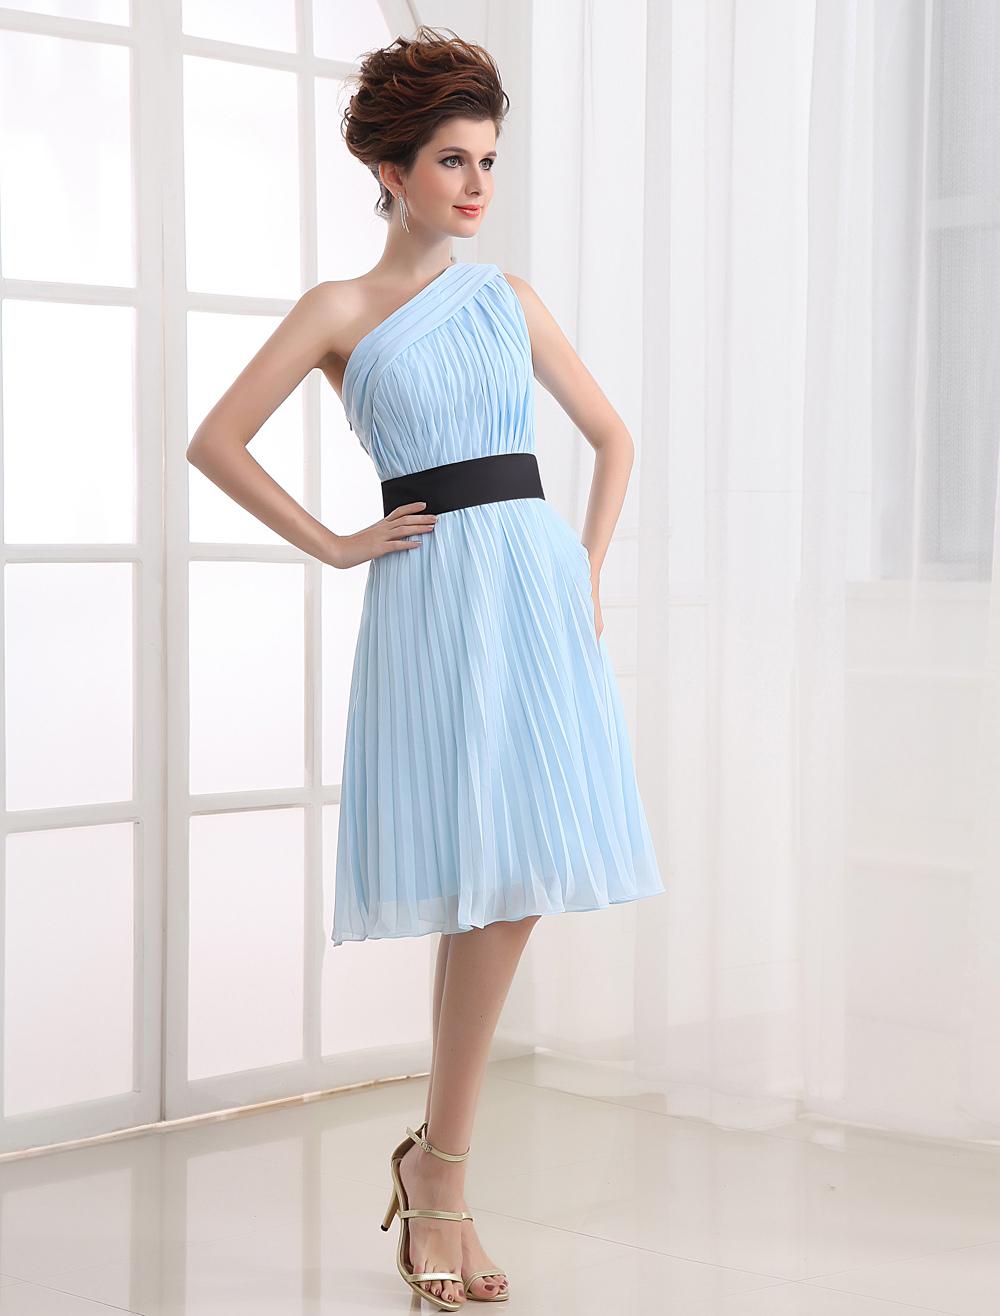 Chiffon Cocktail Dress Pastel Blue One Shoulder Sash Ruched Short Prom Dress (Wedding Cheap Party Dress) photo